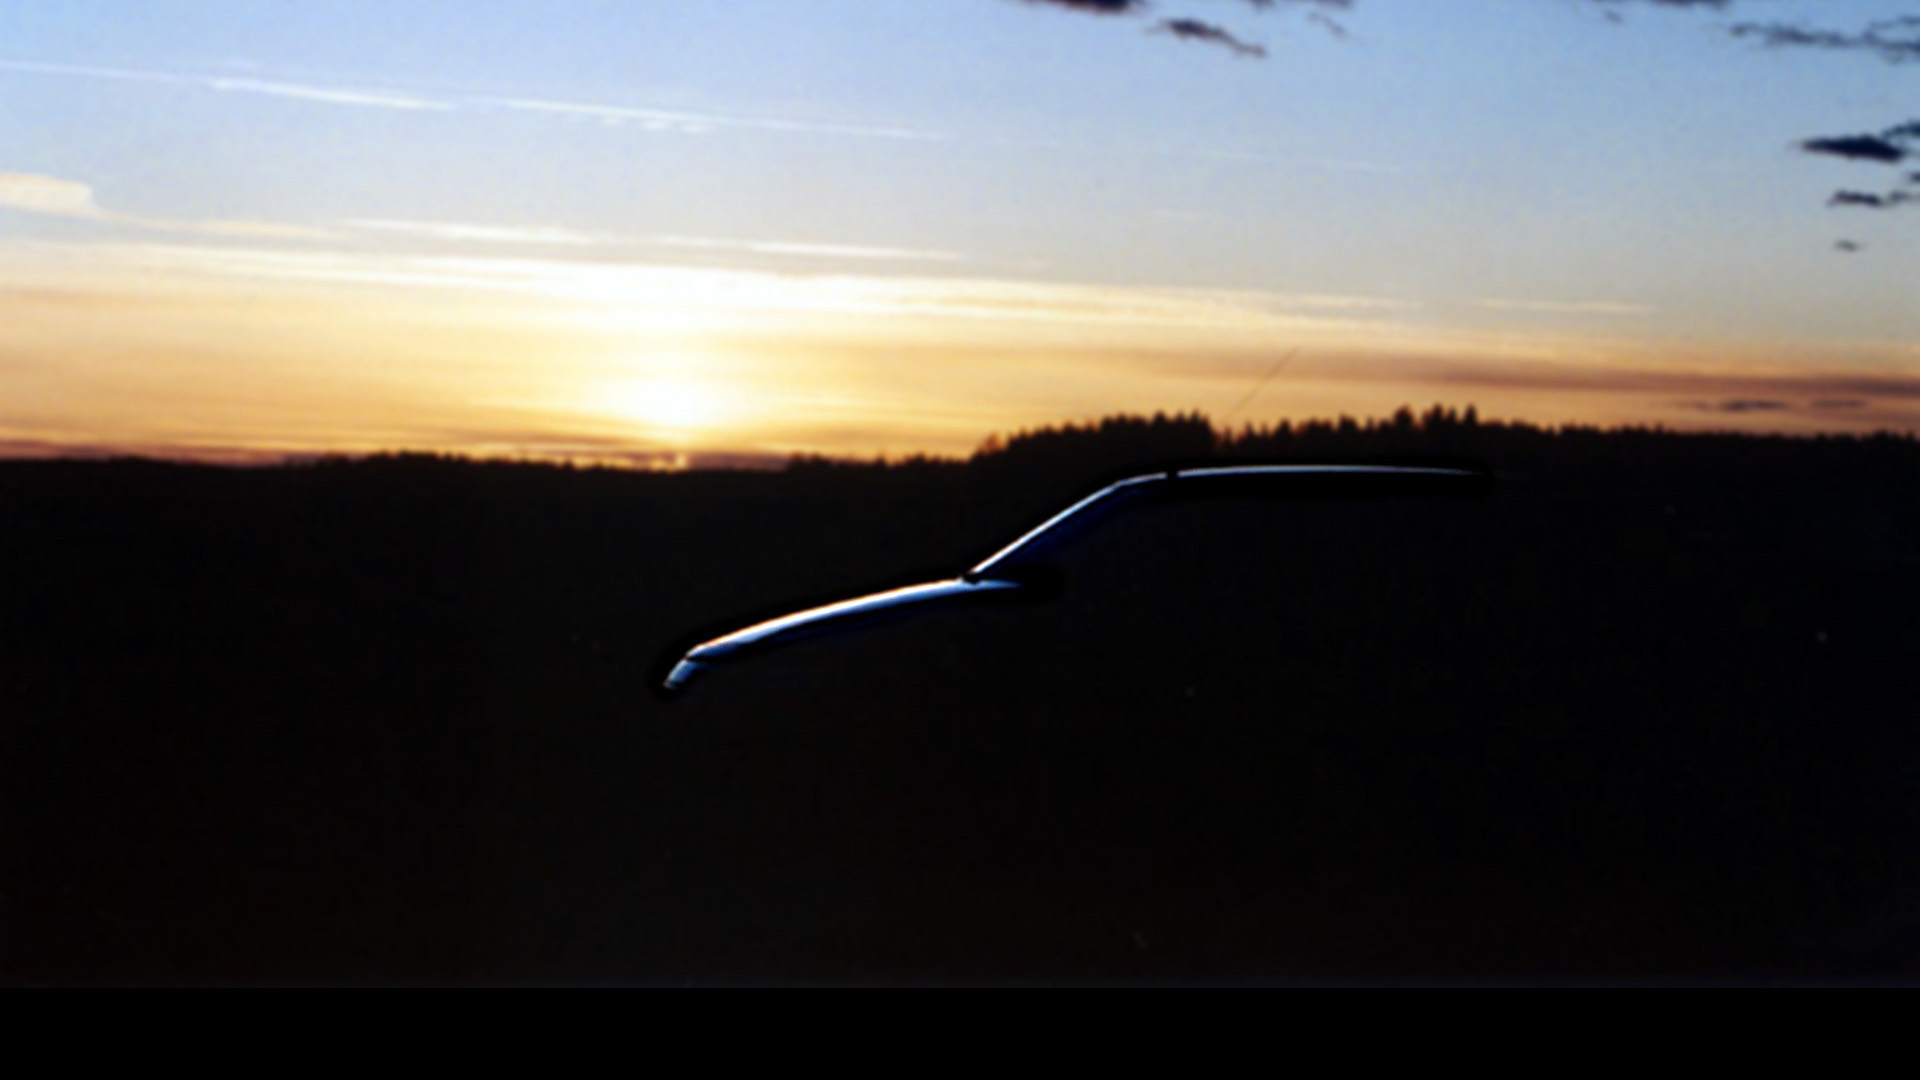 Citroën XM V6:n siluetti auringon laskiessa.